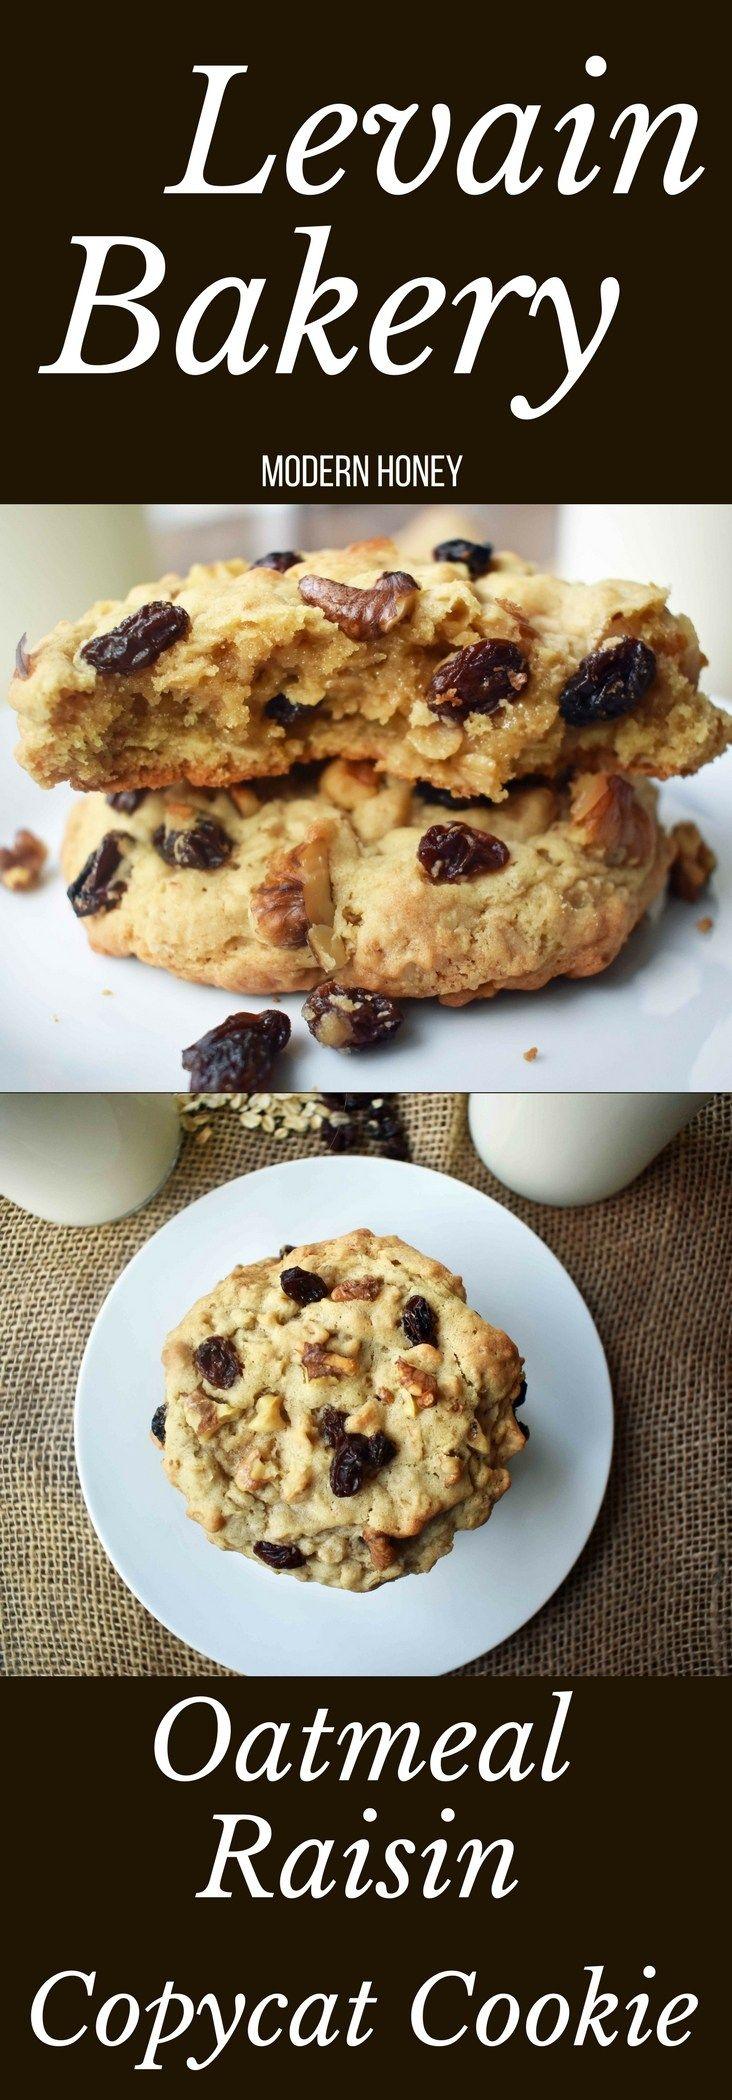 Levain Bakery Oatmeal Raisin Cookies. The ORIGINAL Levain Bakery Copycat Oatmeal Raisin Cookie by Modern Honey. Soft and chewy oatmeal raisin cookie from the popular New York City bakery -- Levain Bak(Bake Cheesecake New York)